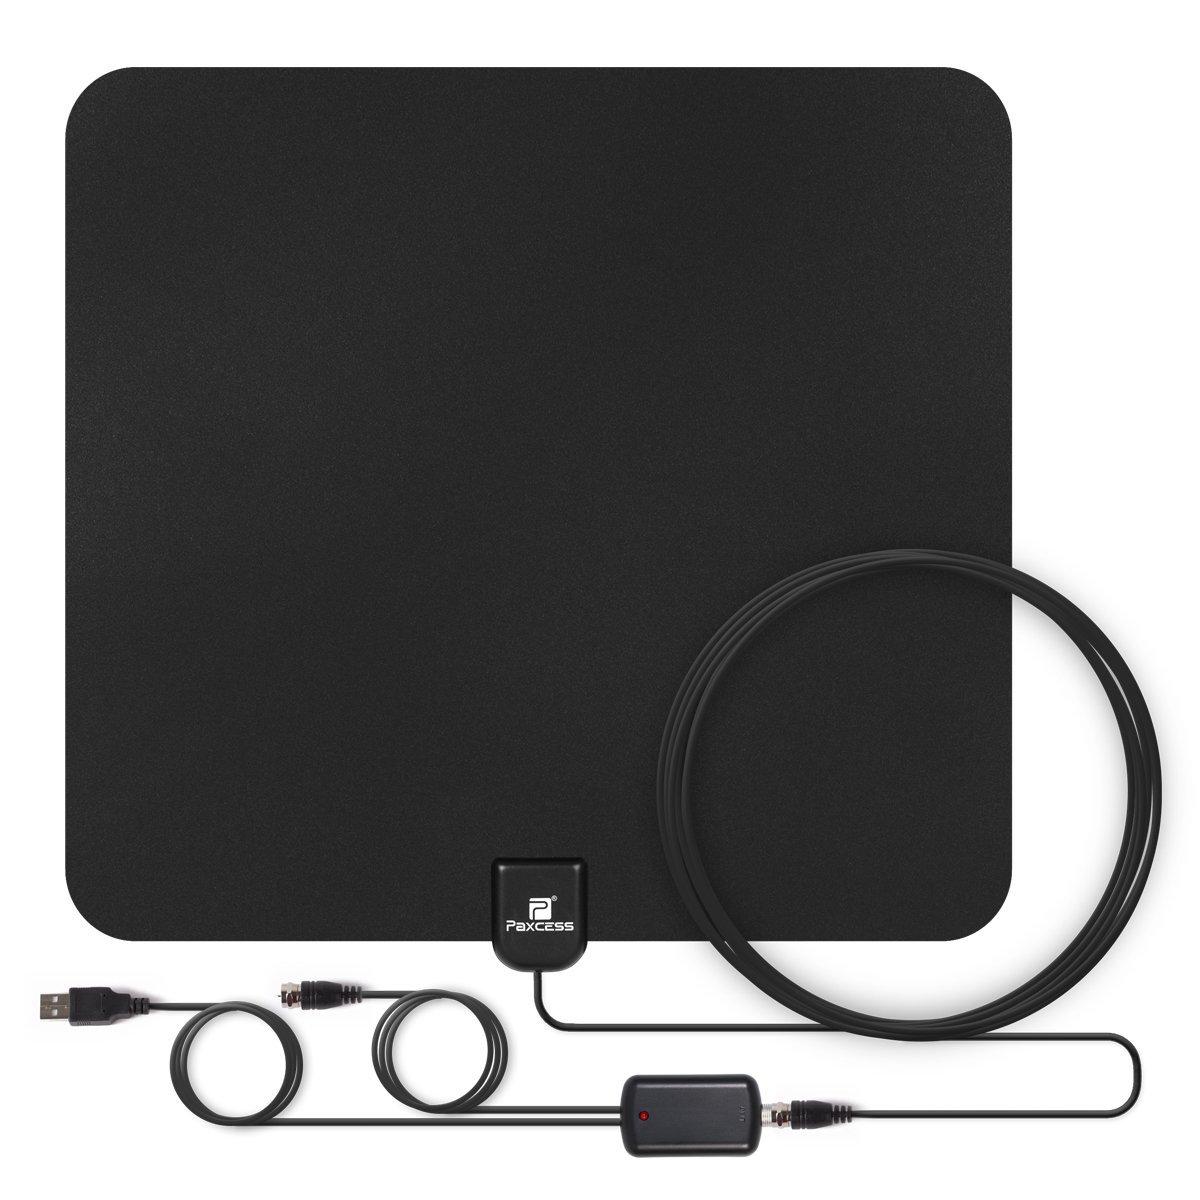 HDTV Digital Antenna on Amazon $6.86 AC w/ Free Prime Shipping